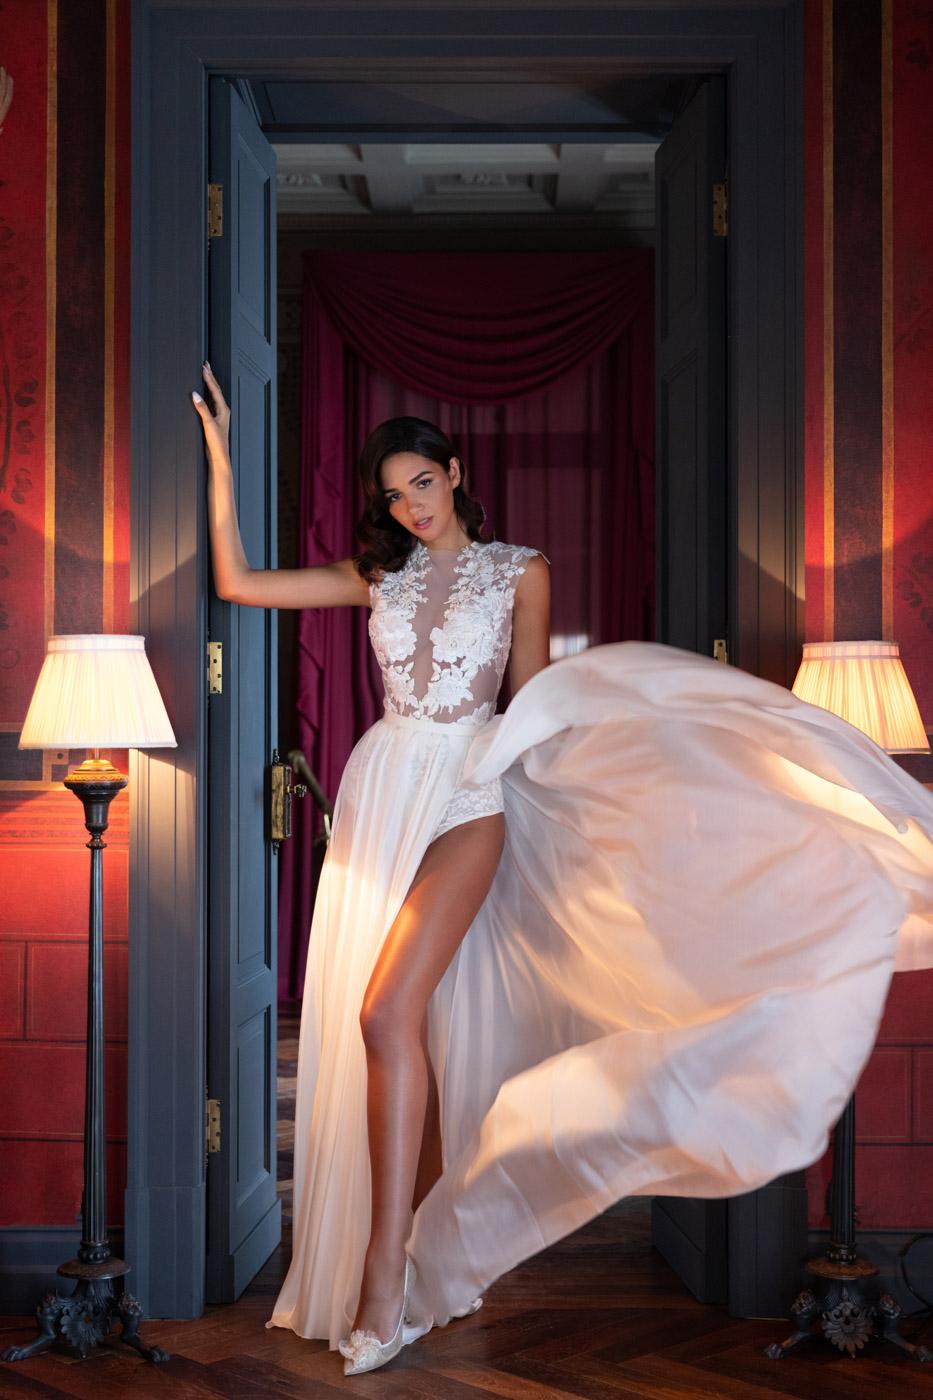 Gorgeous bride at Villa Astor, Sorrento, Italy - photo by Adagion Studio